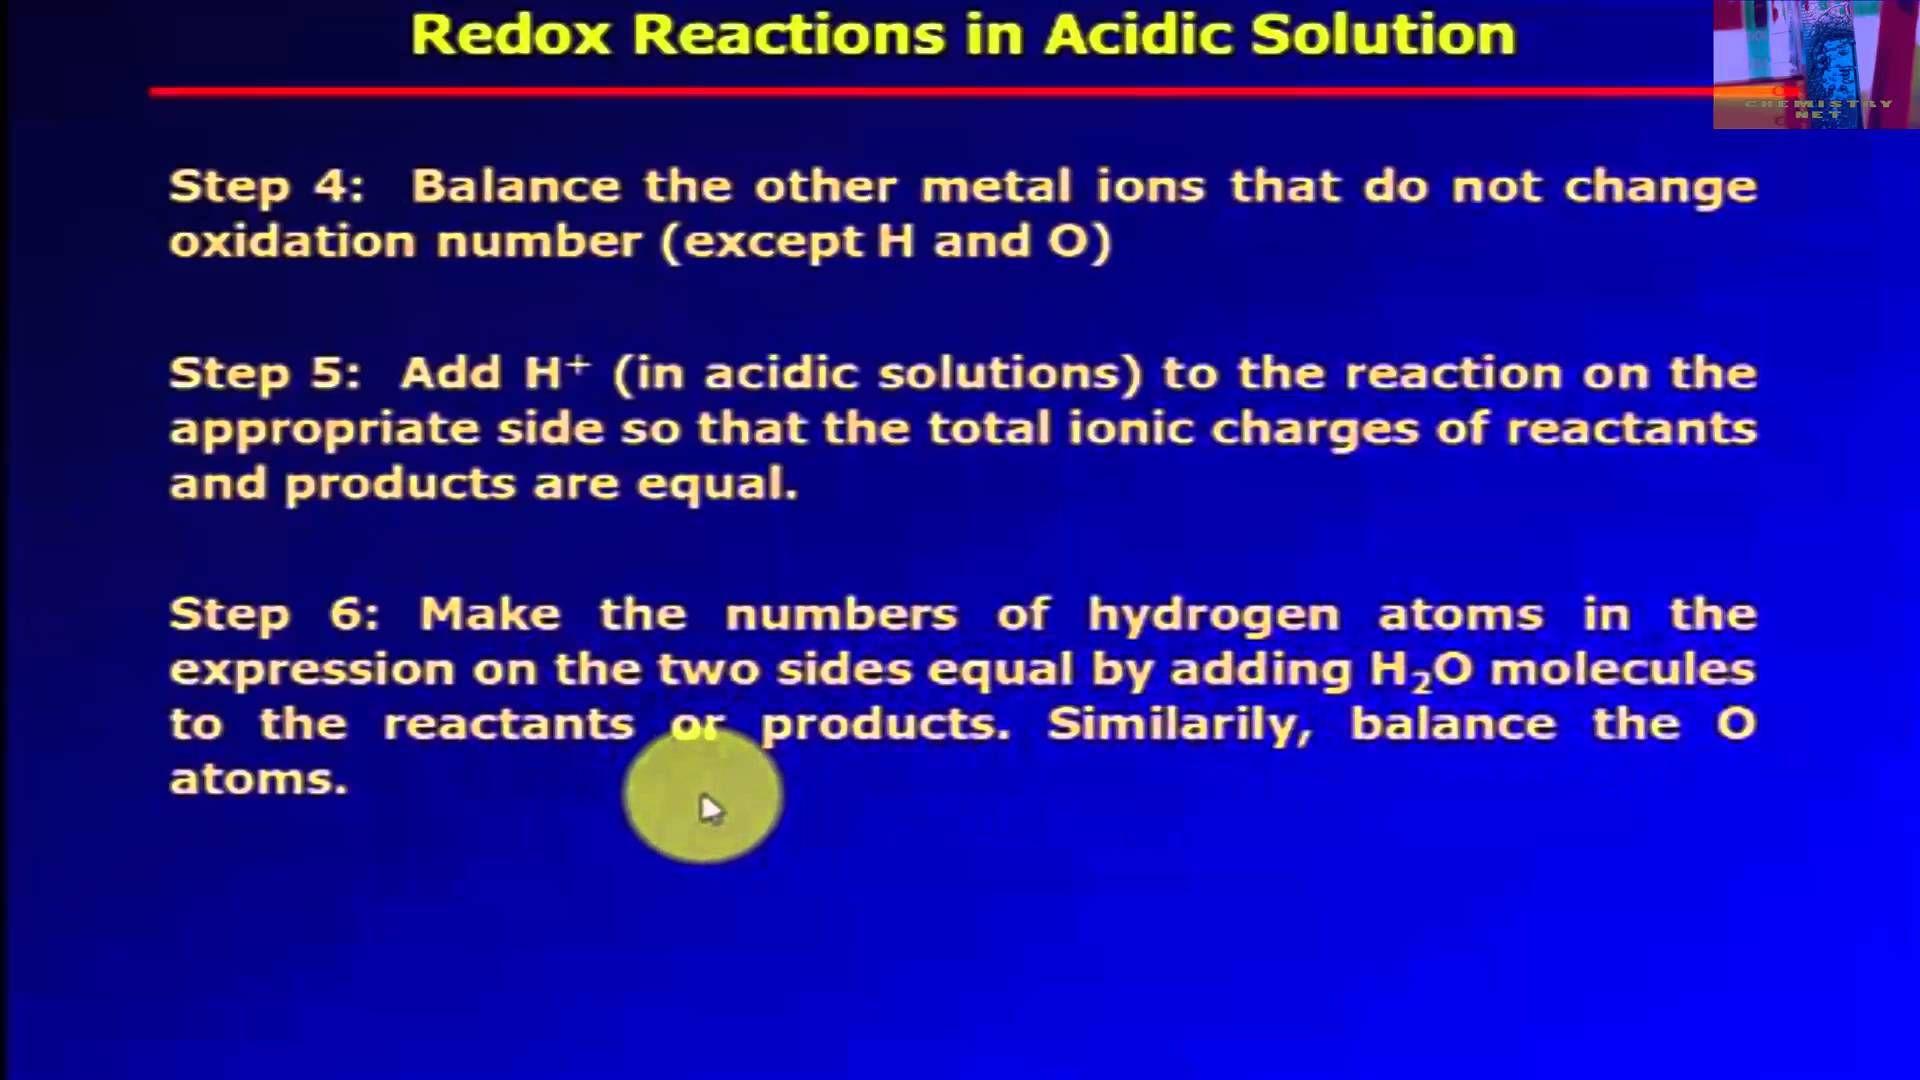 Balancing Oxidation Reduction Reactions Acidic Solution